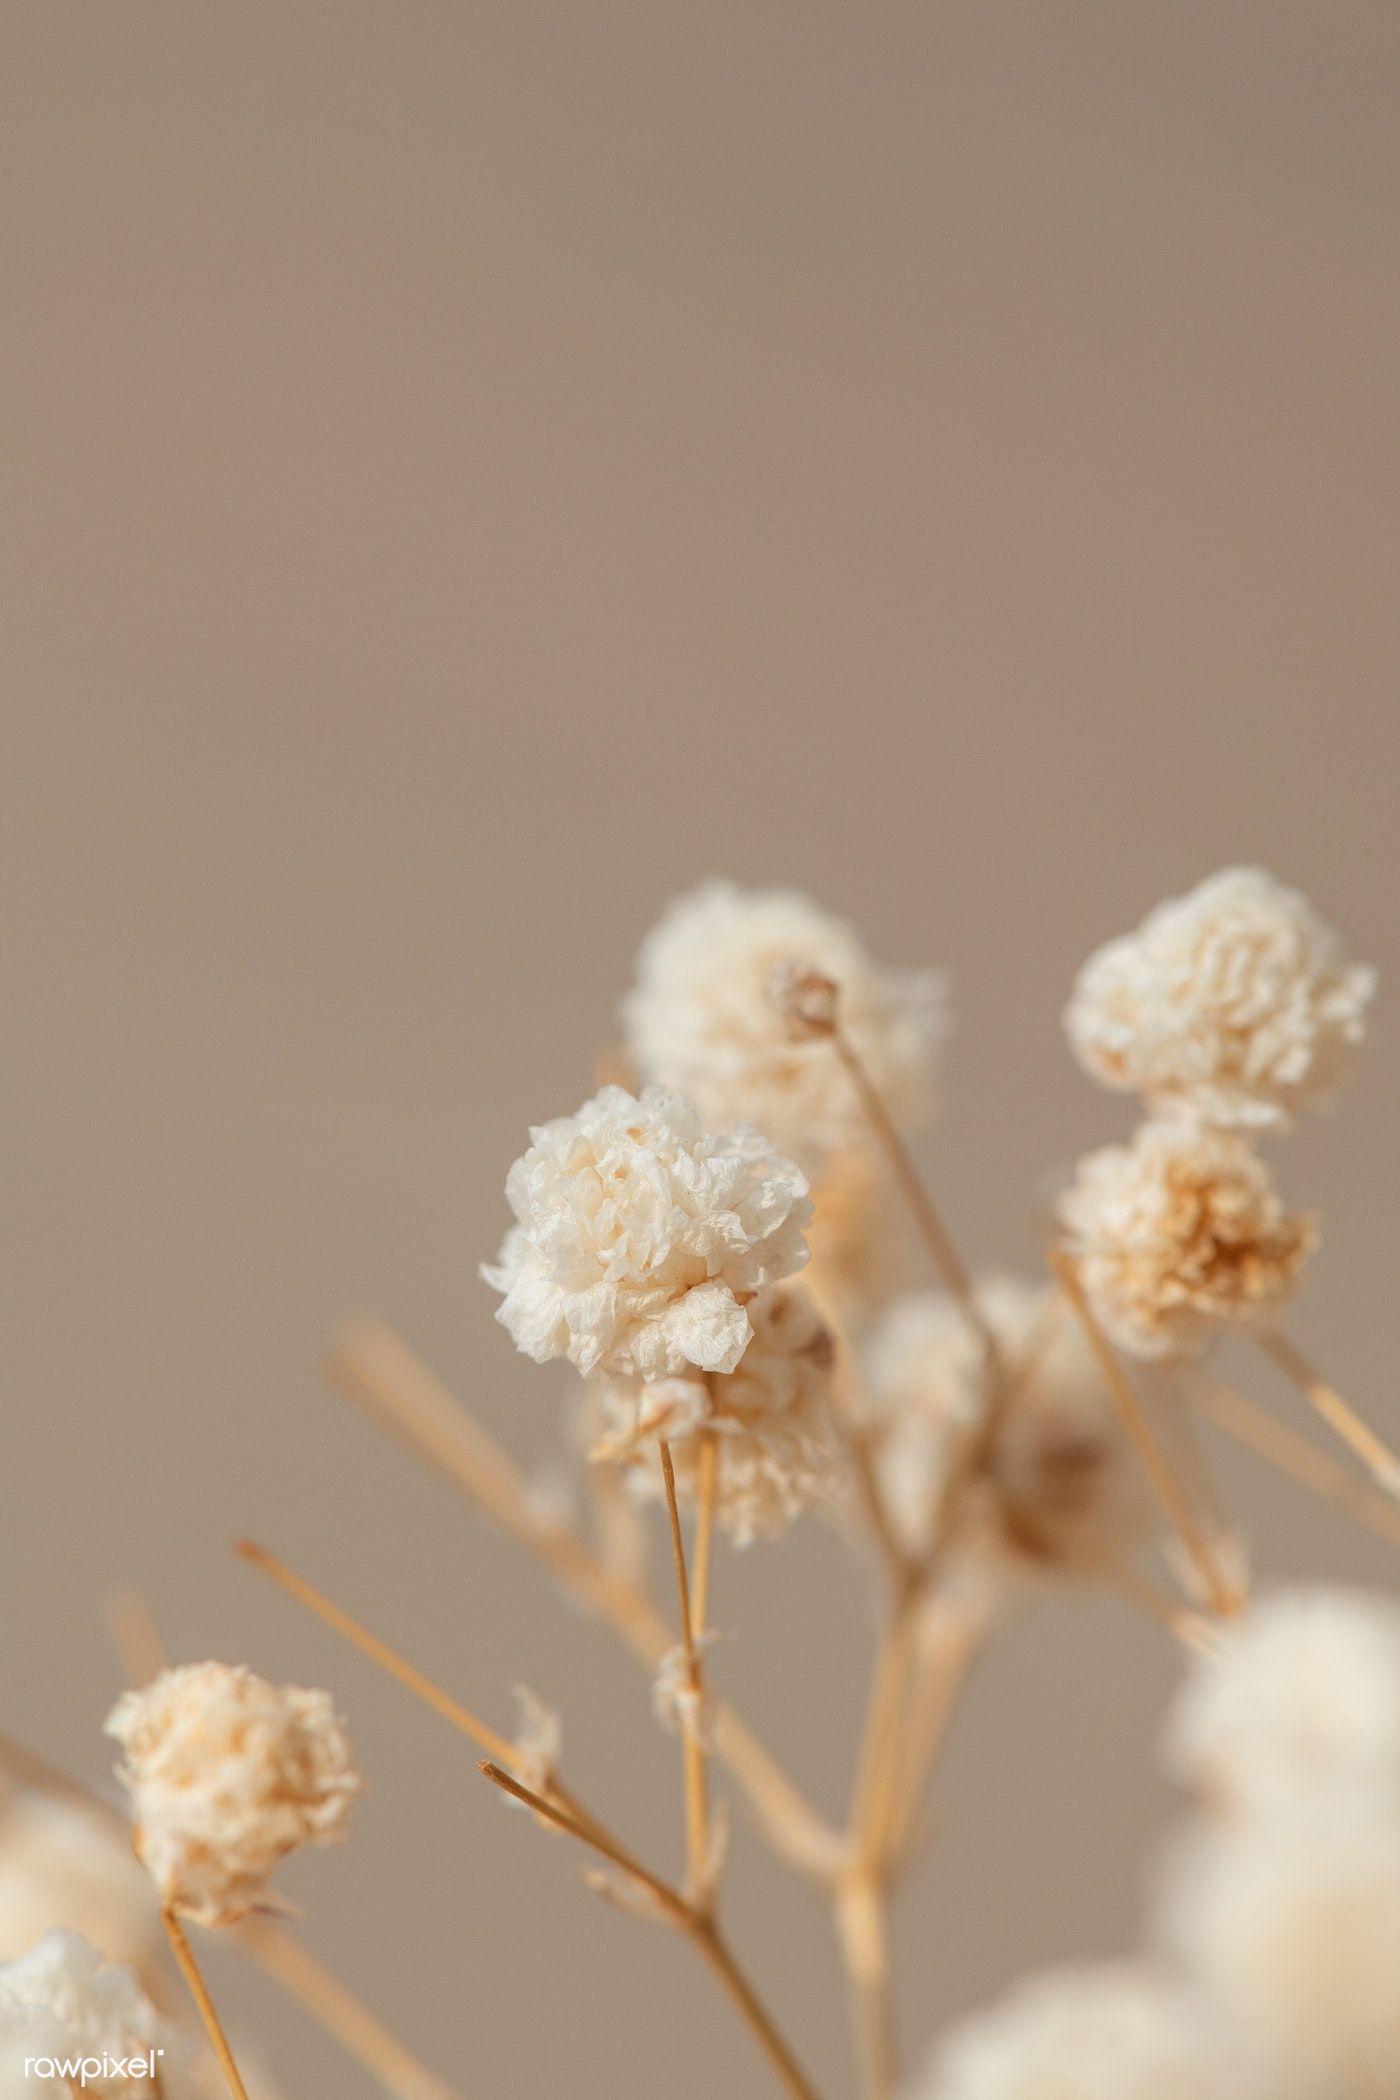 Dried gypsophila flowers macro shot | premium image by rawpixel.com / Teddy Rawpixel